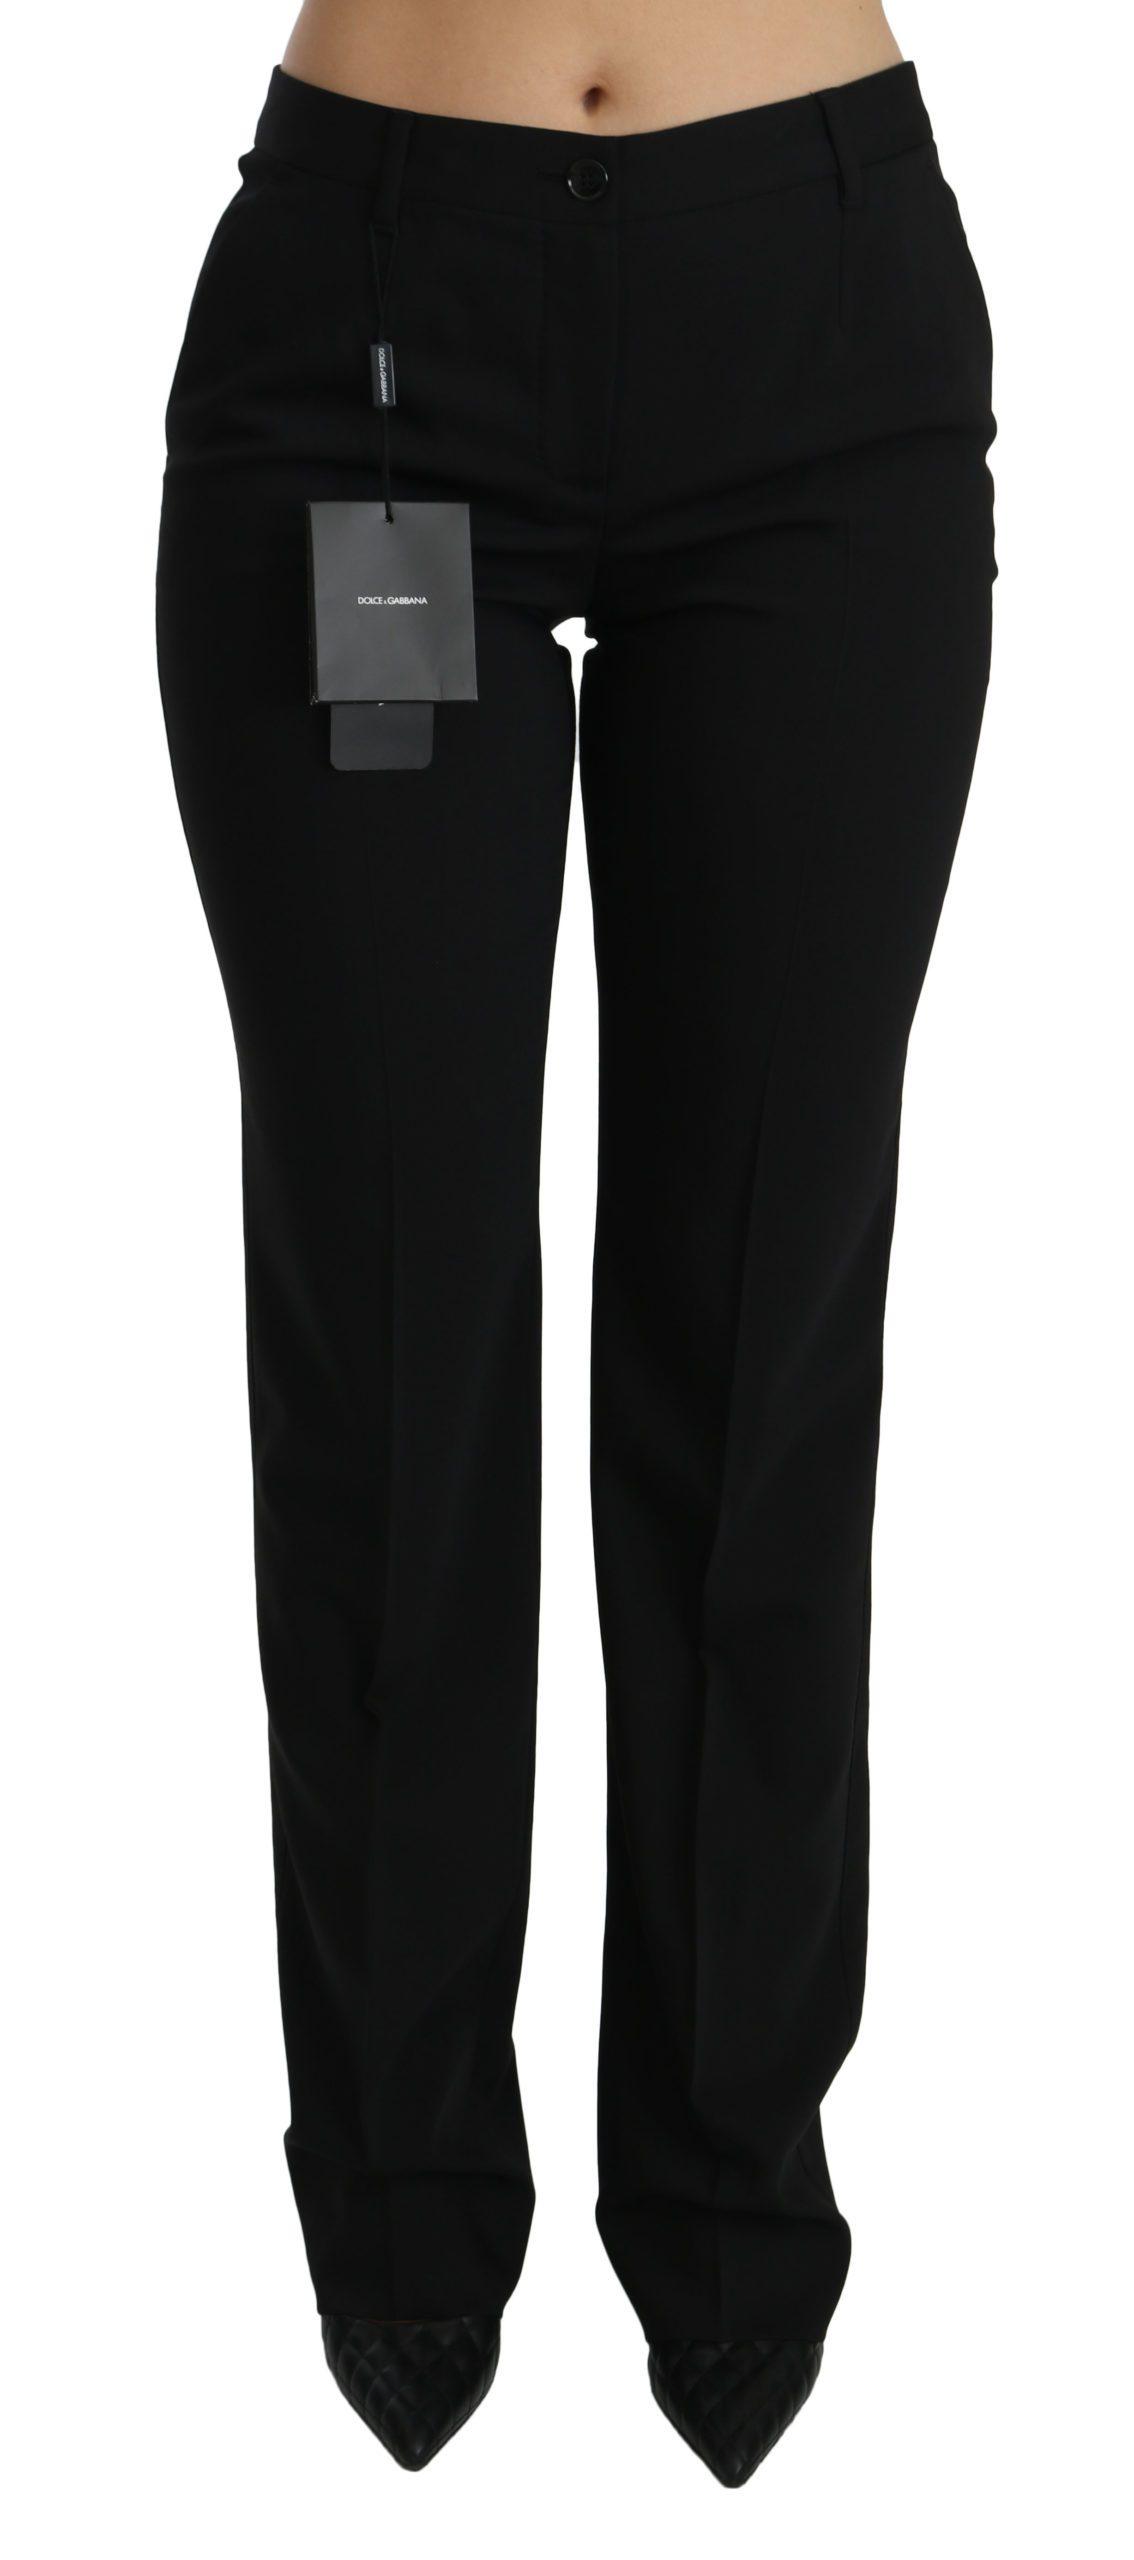 Dolce & Gabbana Women's Mid Waist Skinny Formal Trouser Black PAN70856 - IT40 S